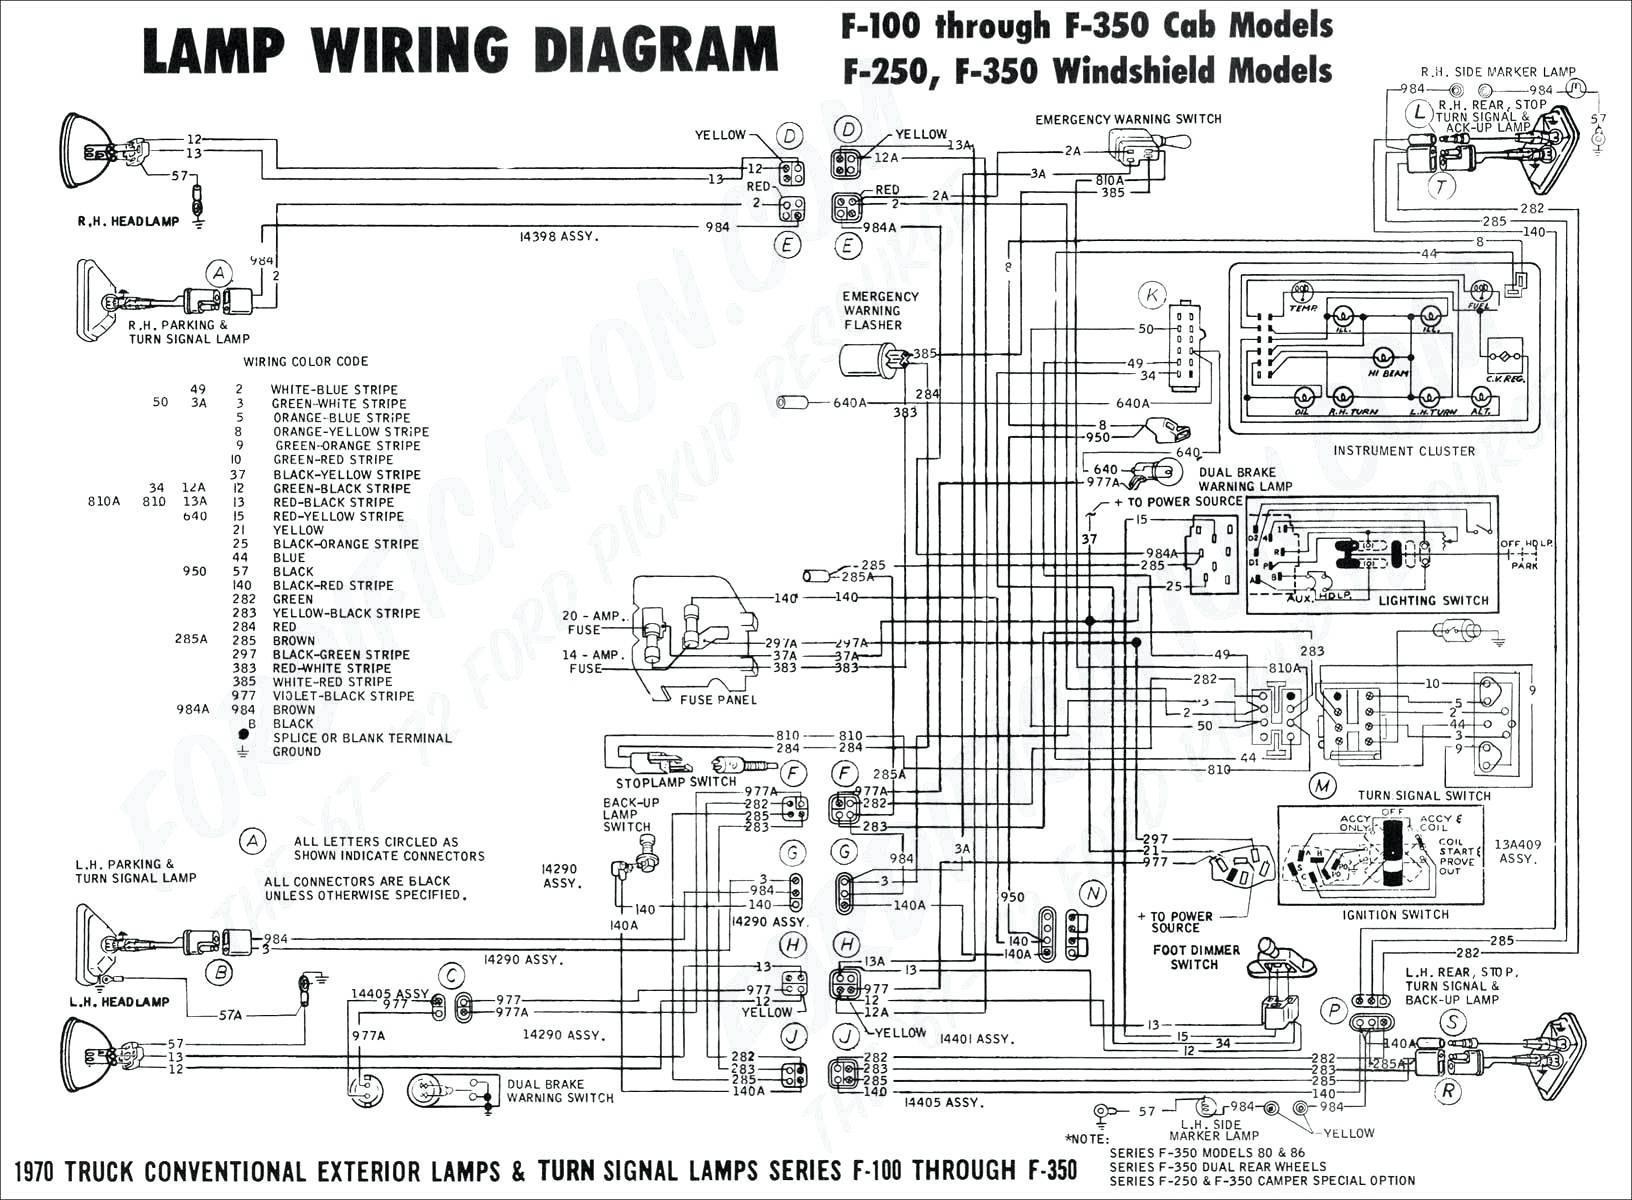 2004 Saturn Ion Engine Diagram Saturn Steering Column Wiring Diagram Worksheet and Wiring Diagram • Of 2004 Saturn Ion Engine Diagram